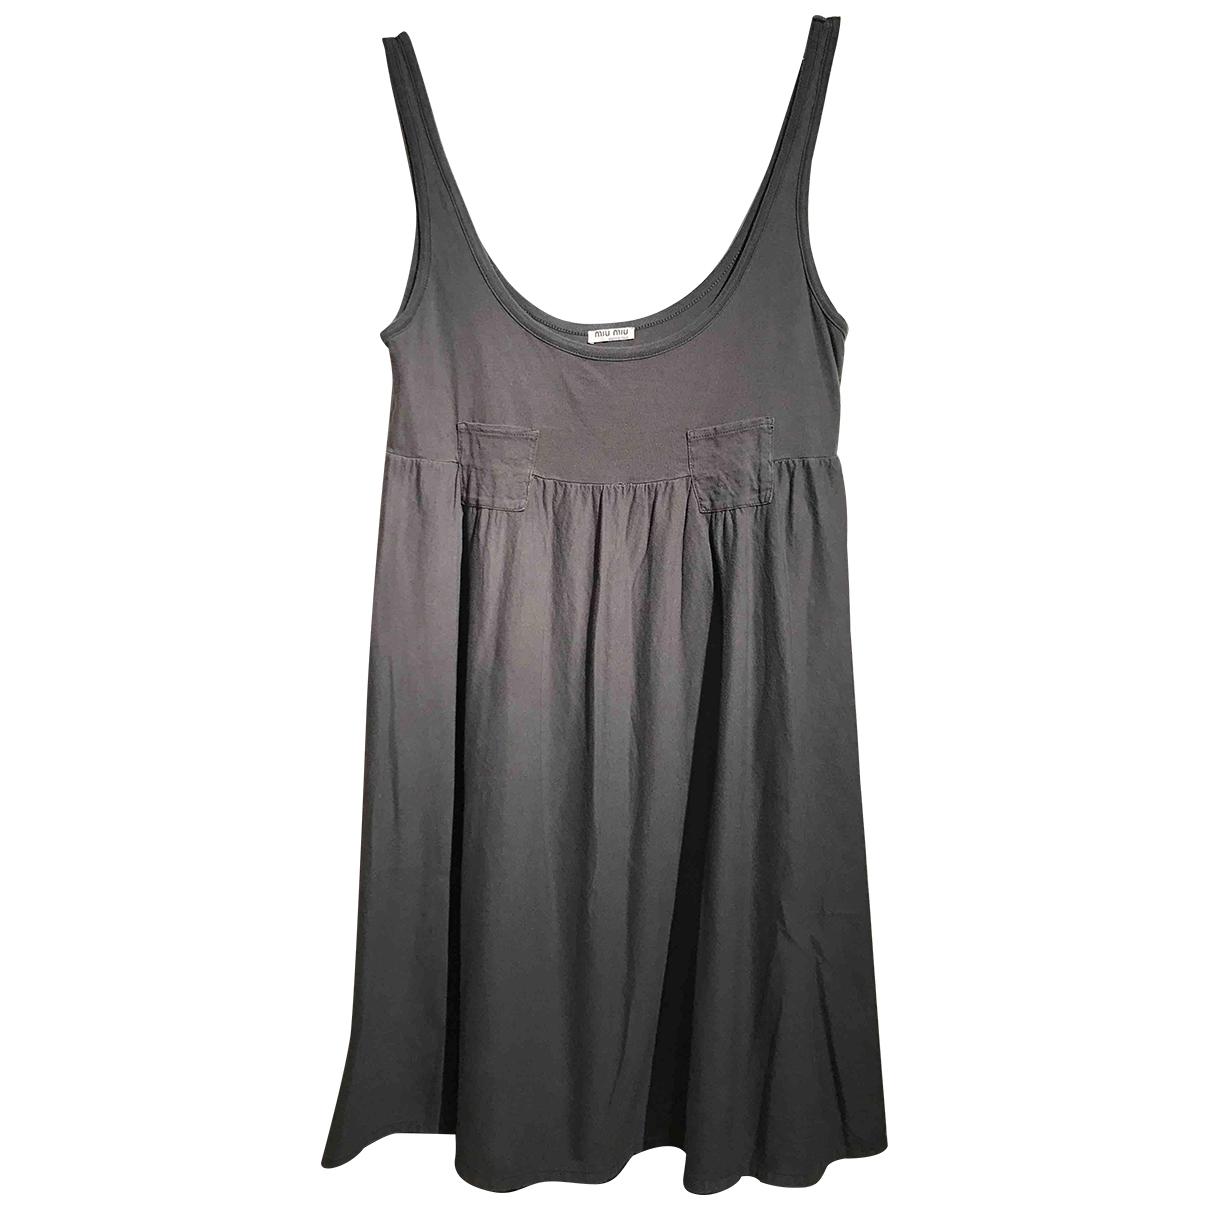 Miu Miu \N Anthracite Cotton dress for Women S International